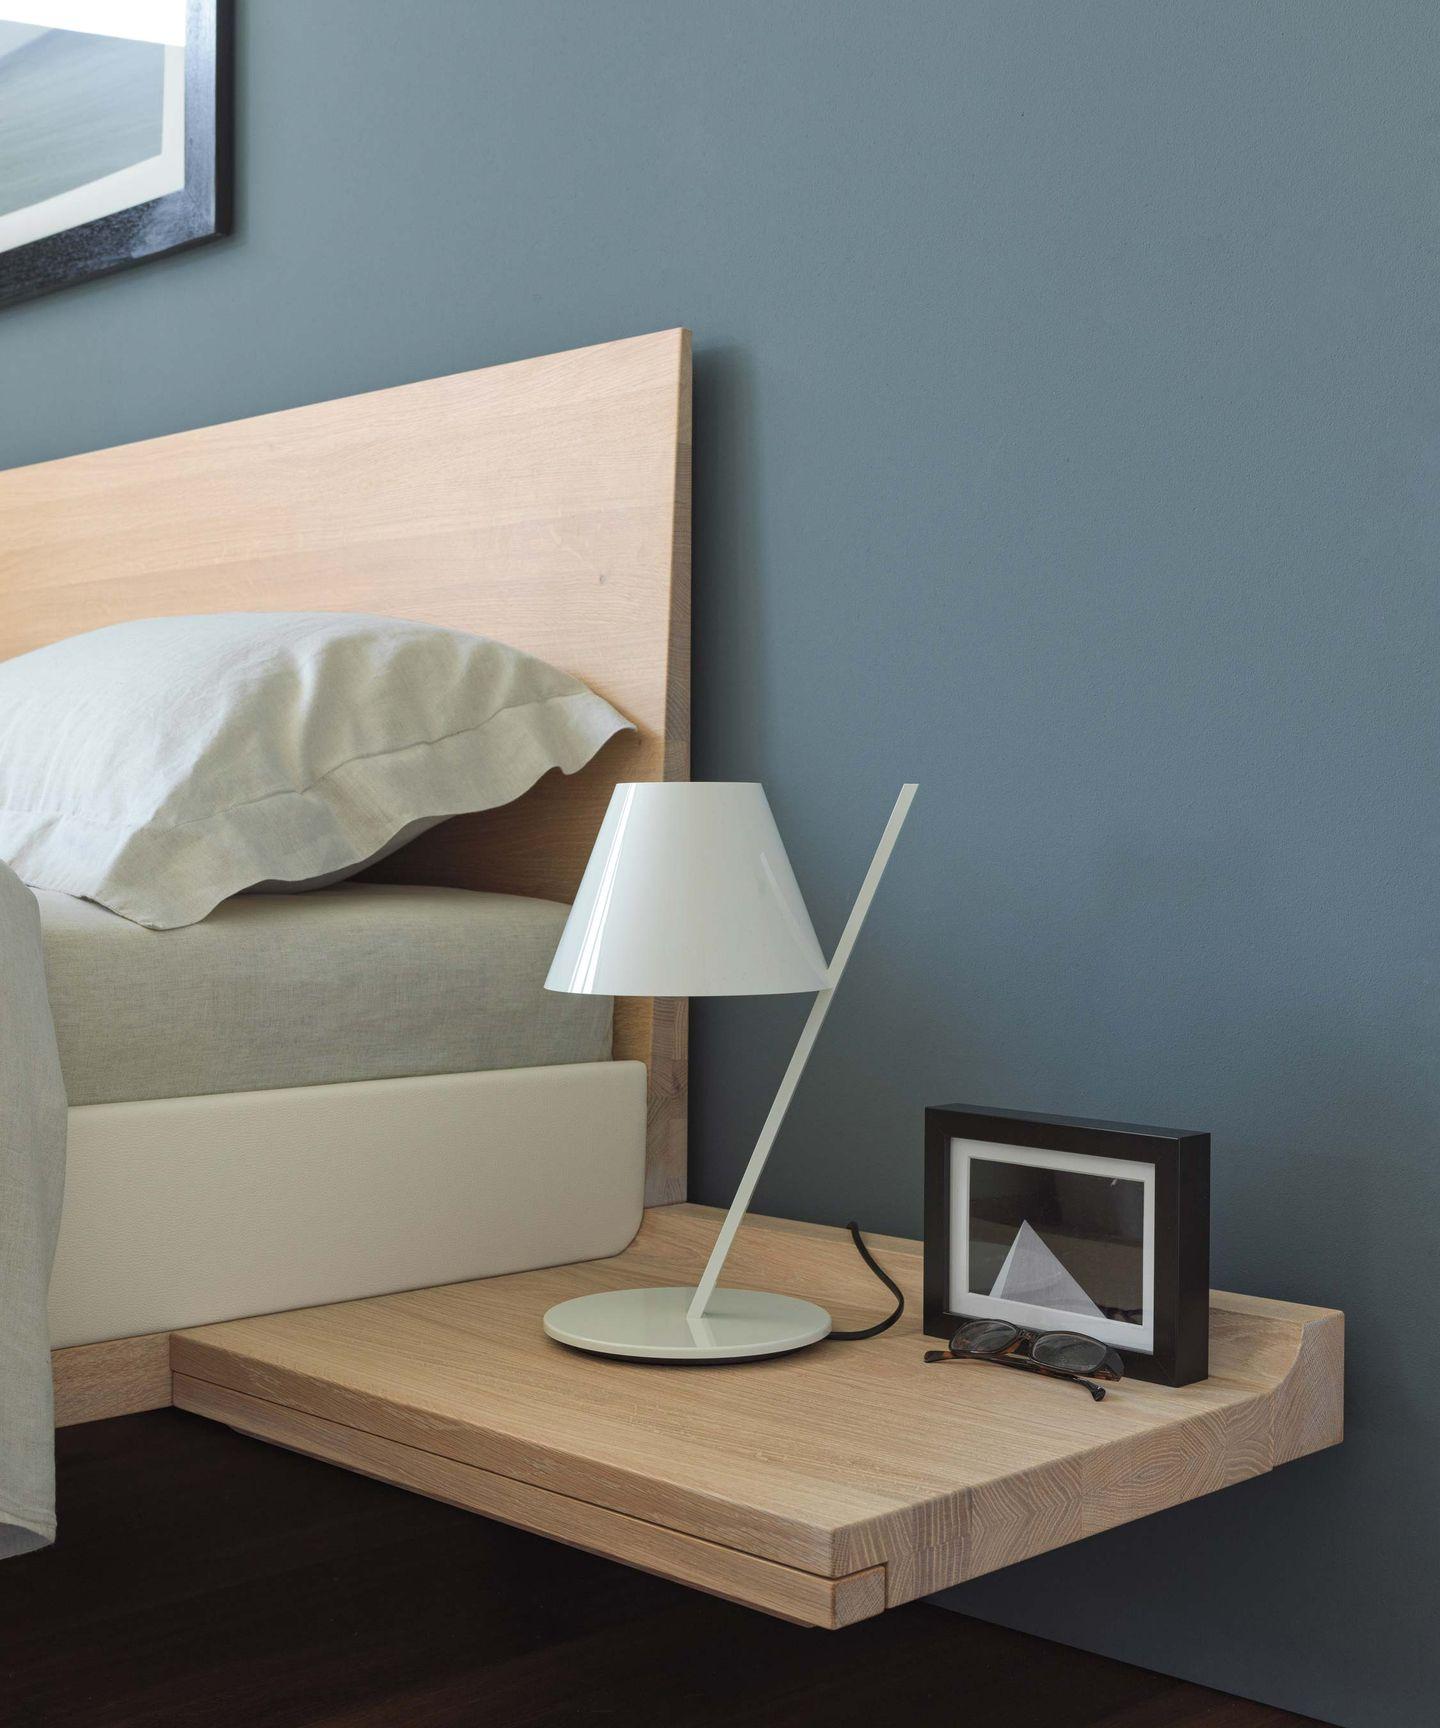 riletto Bett mit Konsole aus massivem Holz